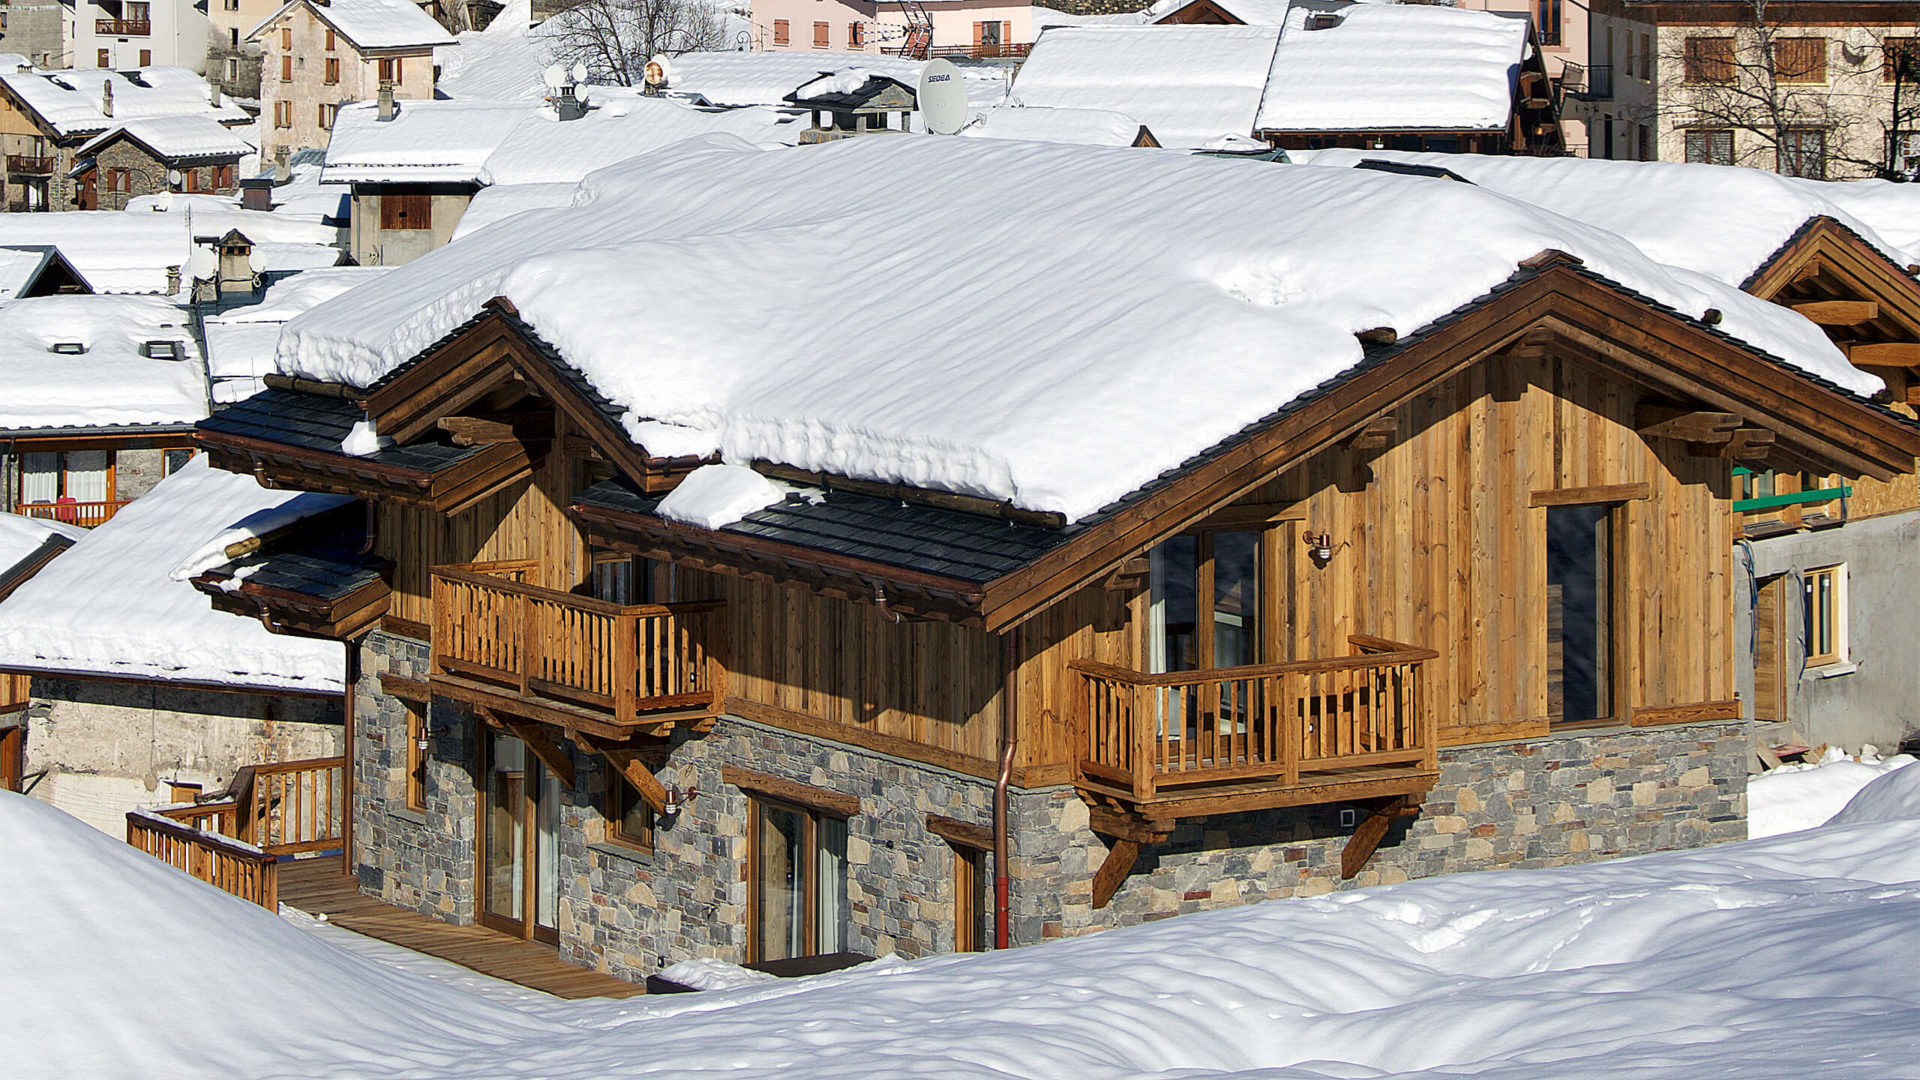 Chalet Mehrotra Vue 2 - Saint Martin de Belleville, Savoie